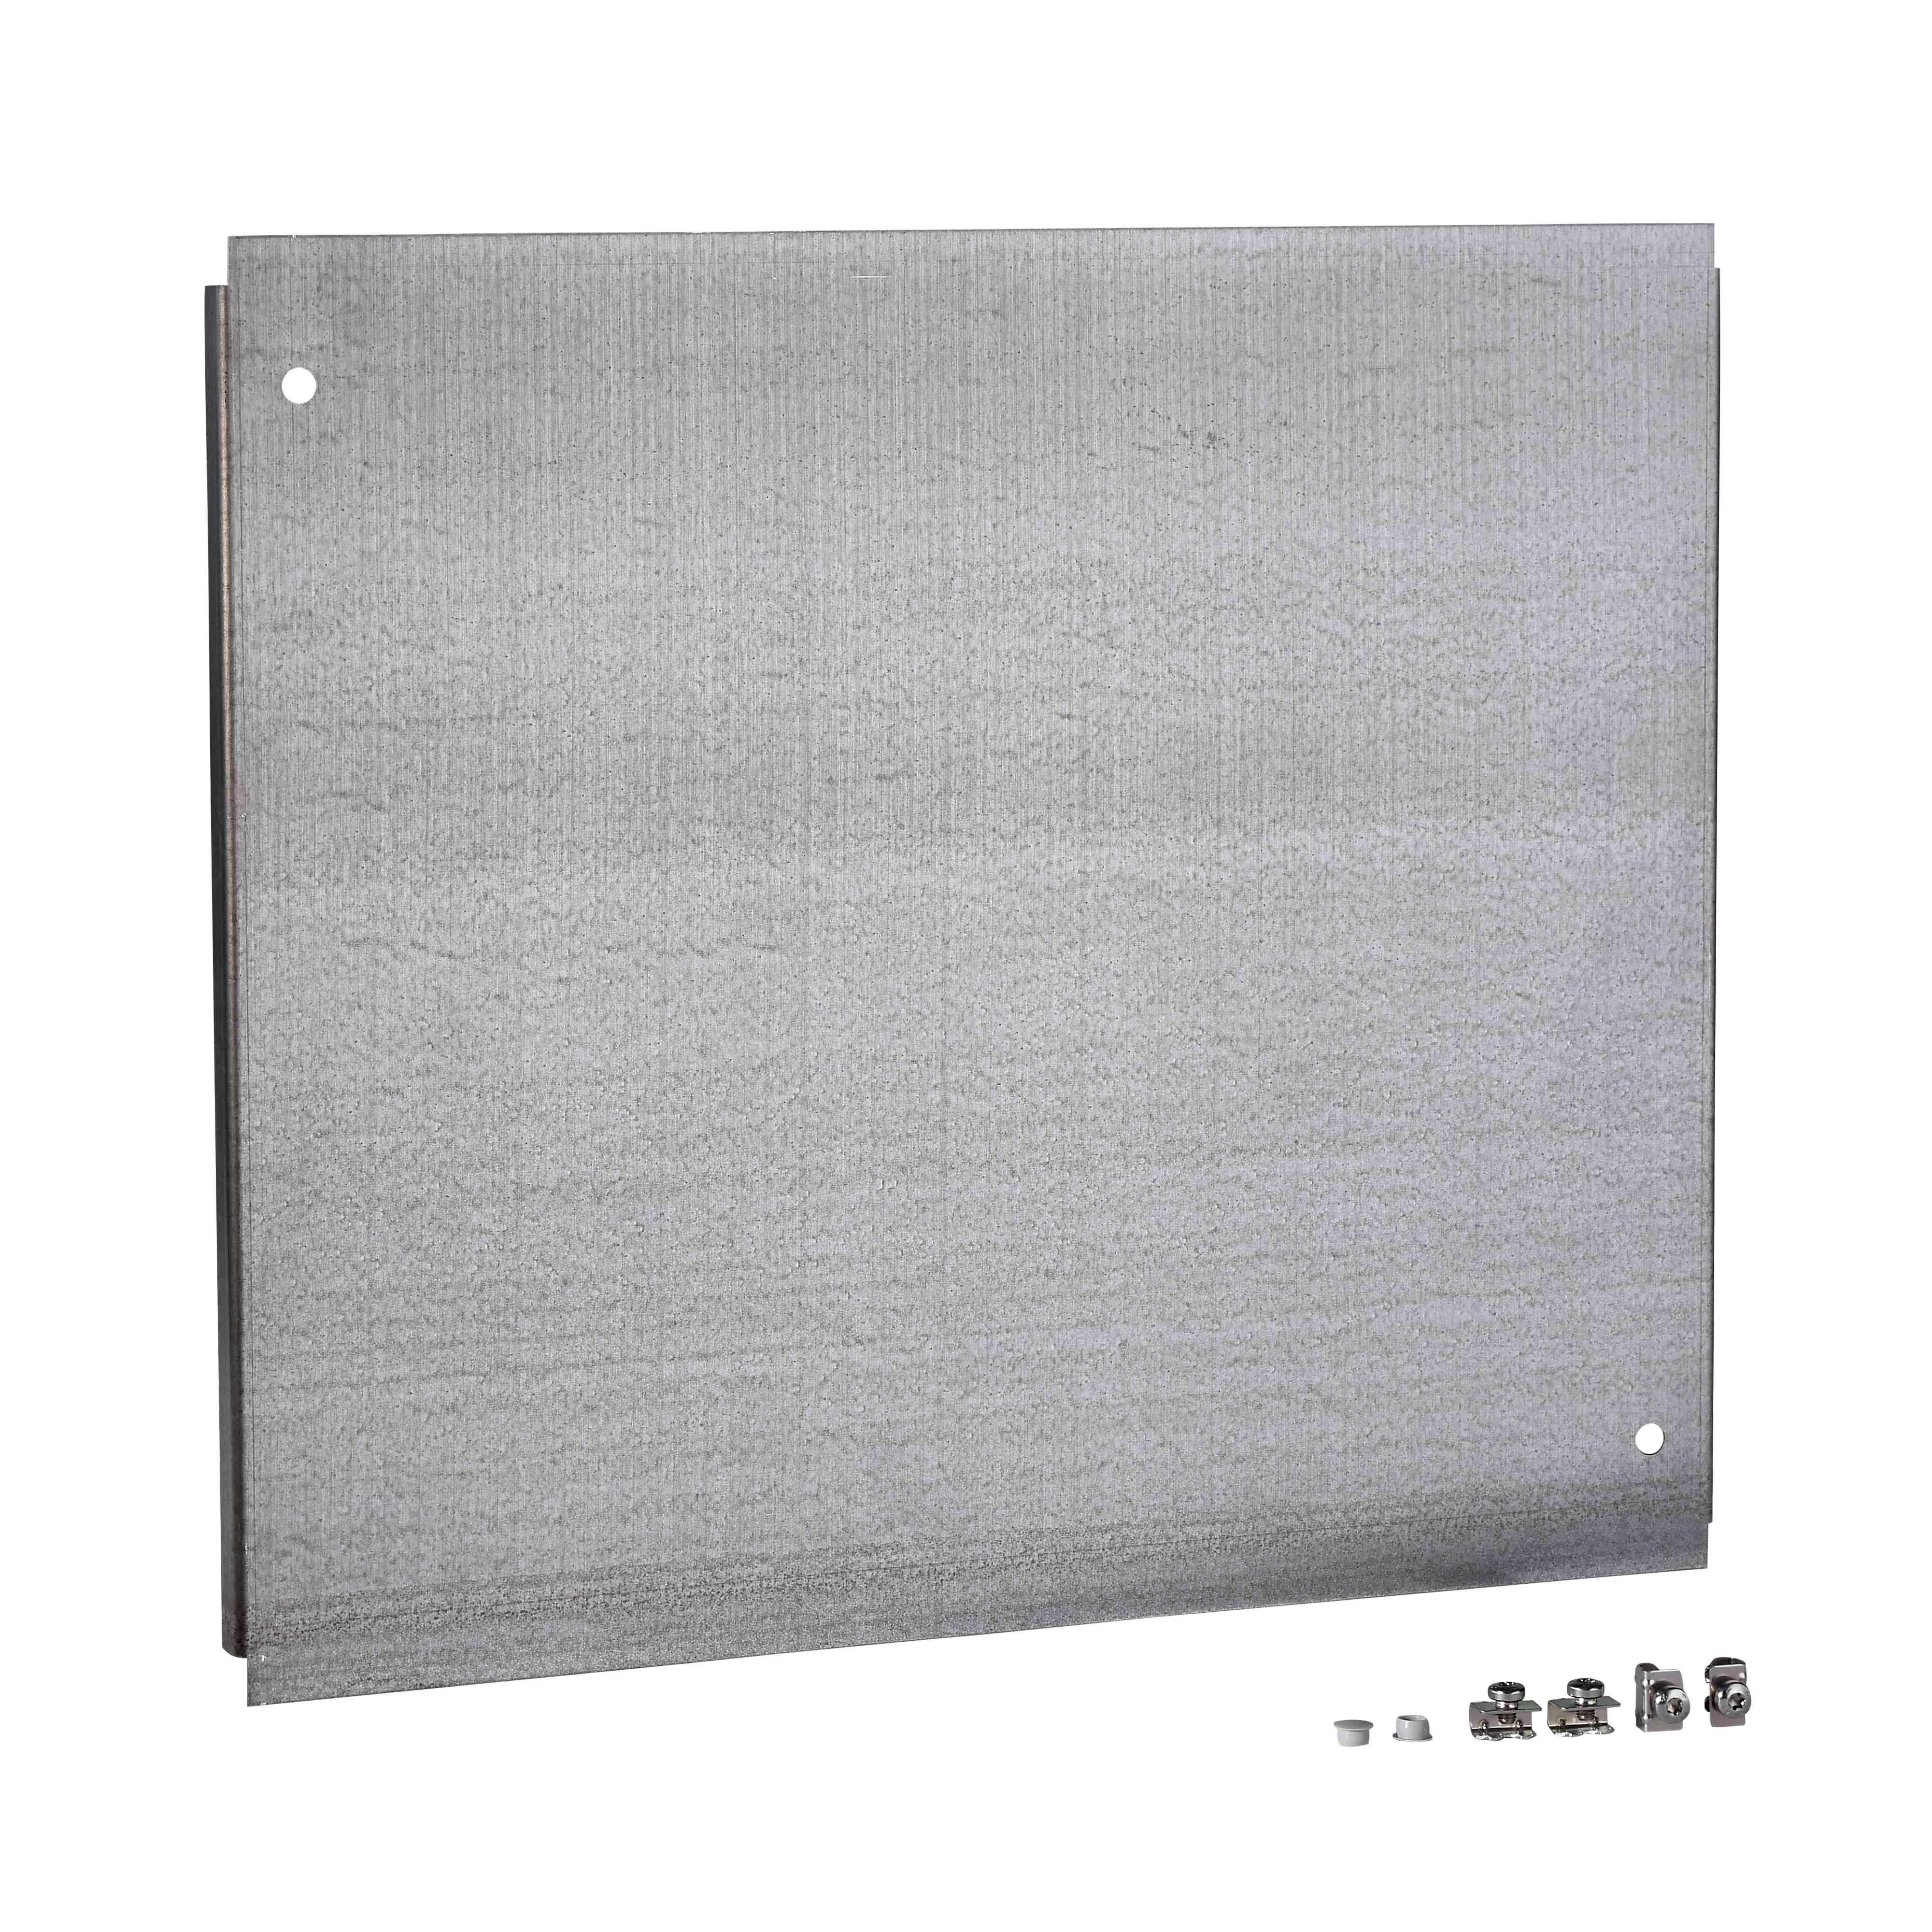 Spacial SF navadna plošča kab. uvodnice - pritr. s sponkami - 1600 x 500 mm